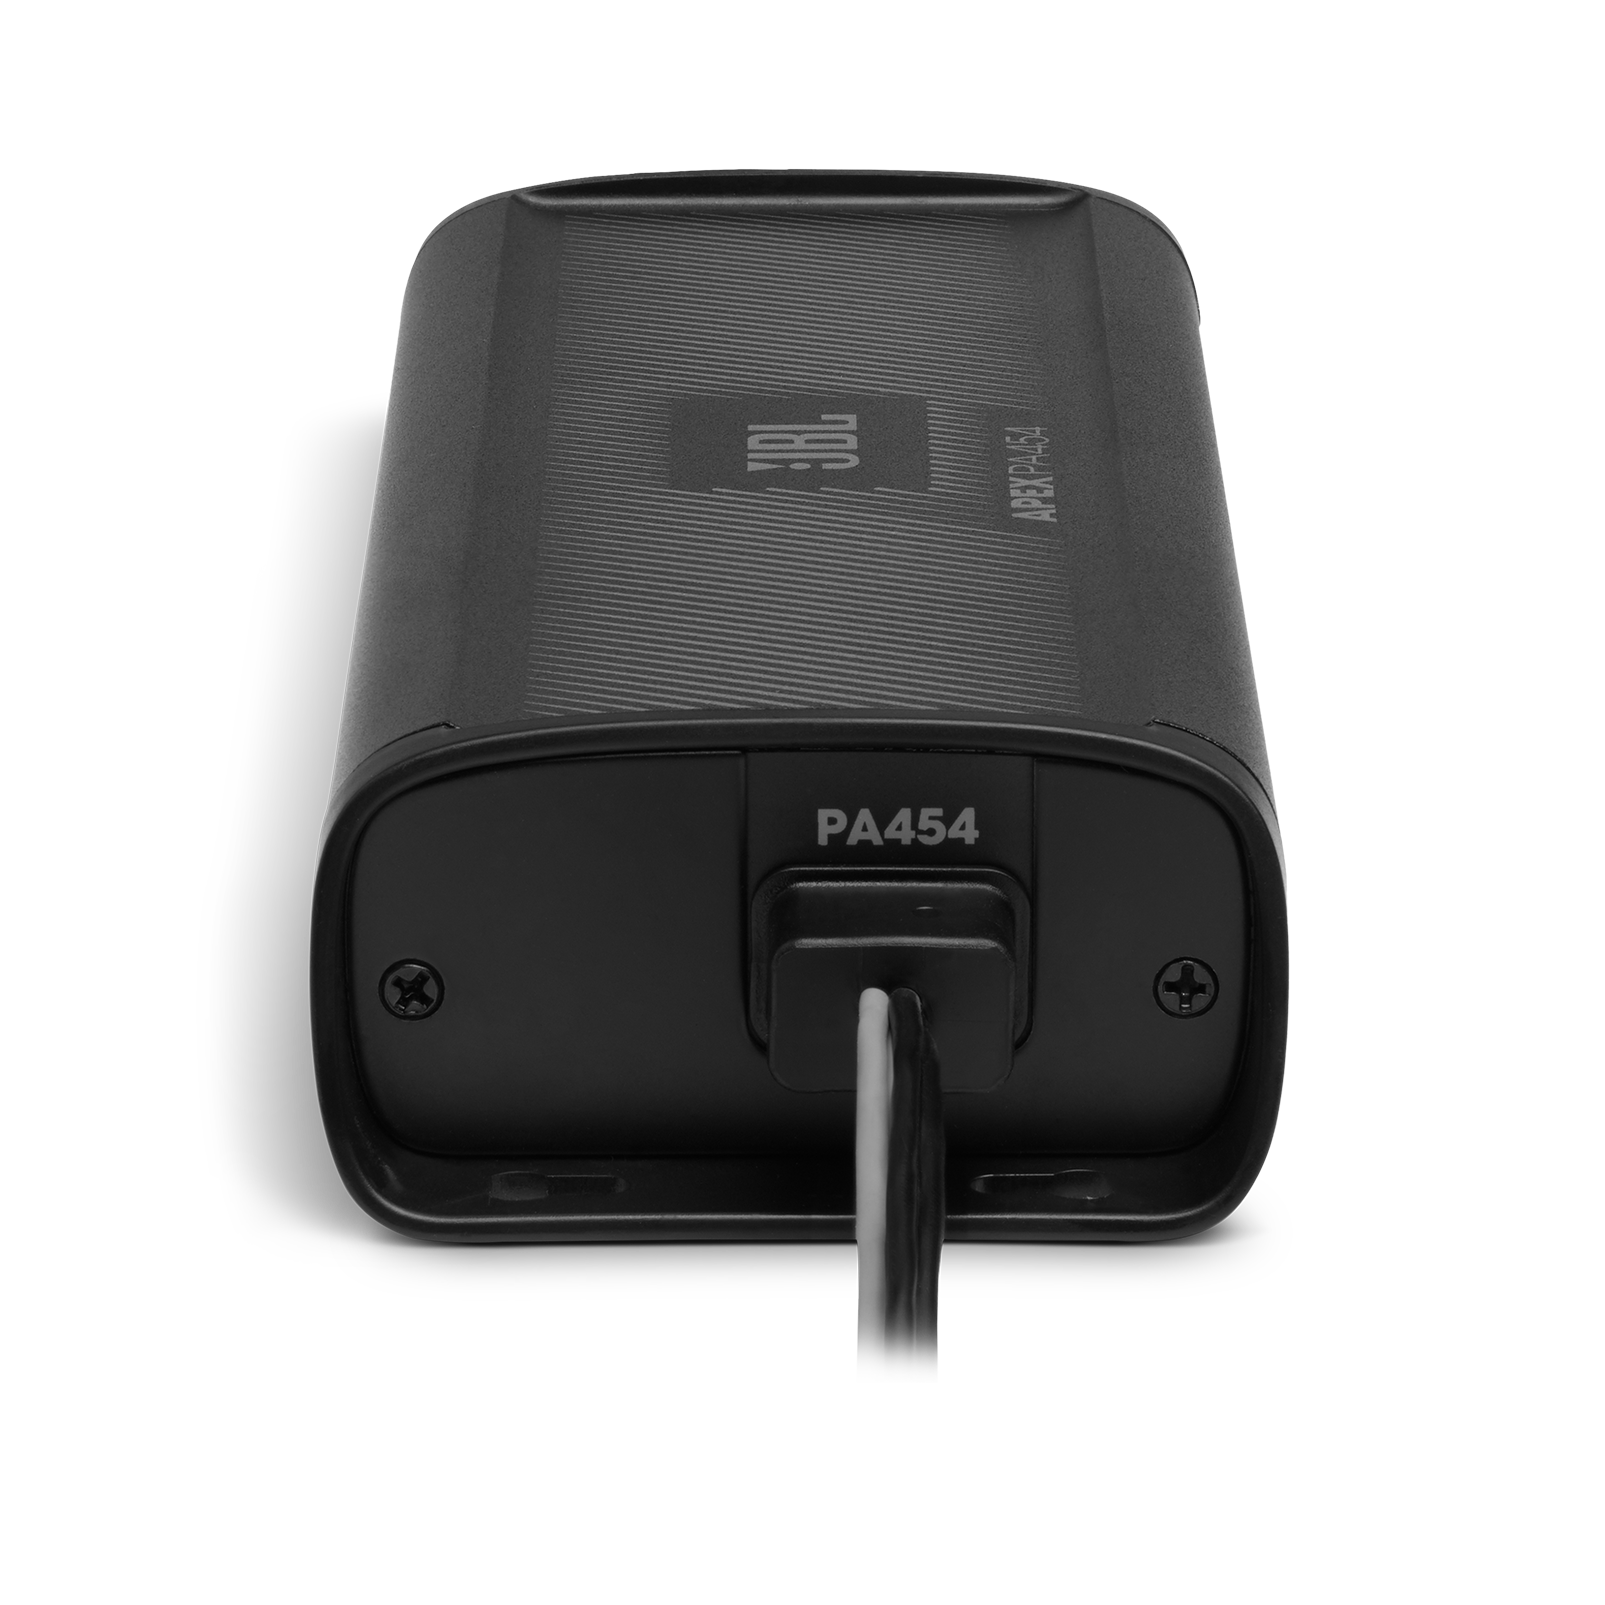 JBL Apex PA454 - Black - Detailshot 3